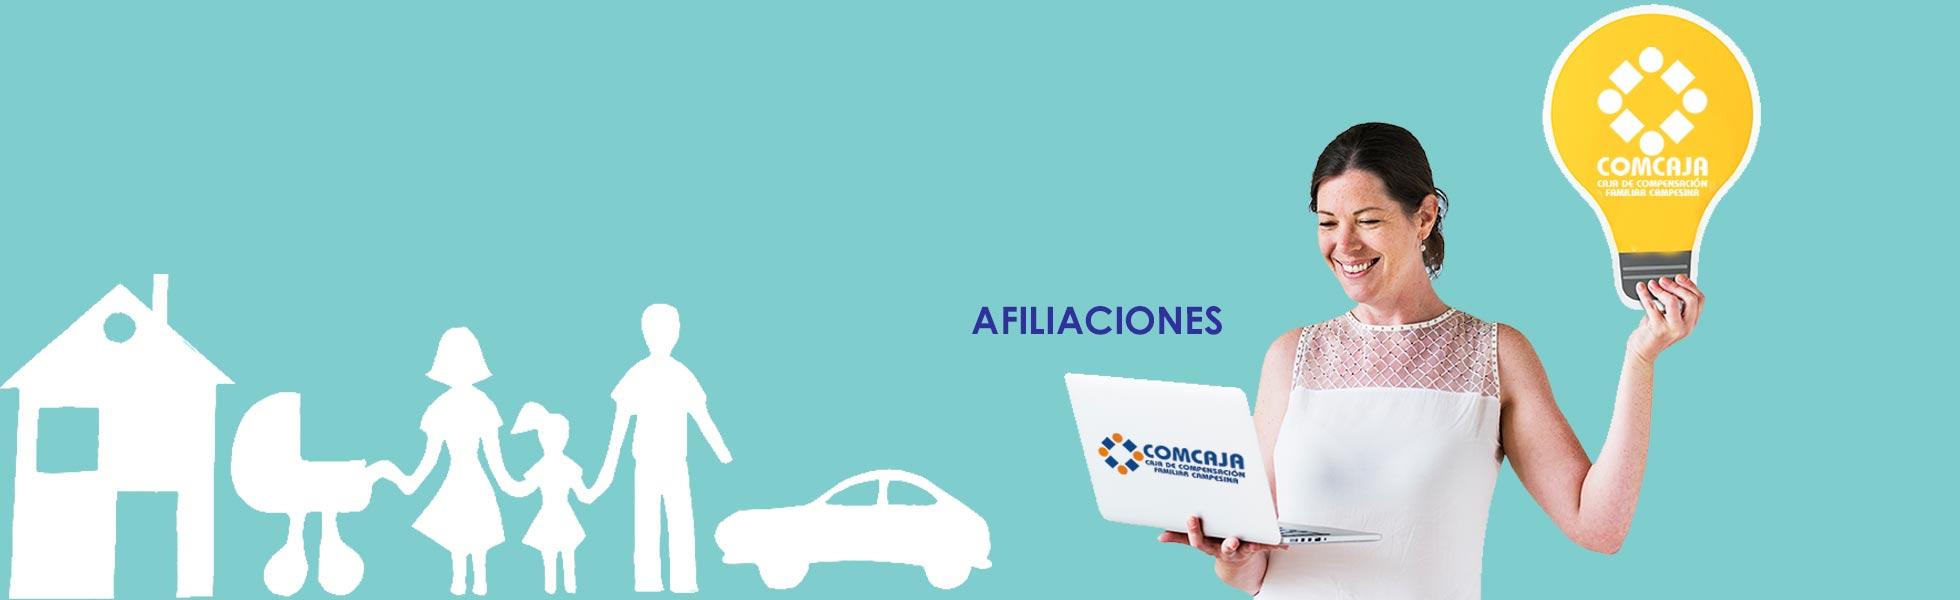 Afiliaciones-Comcaja